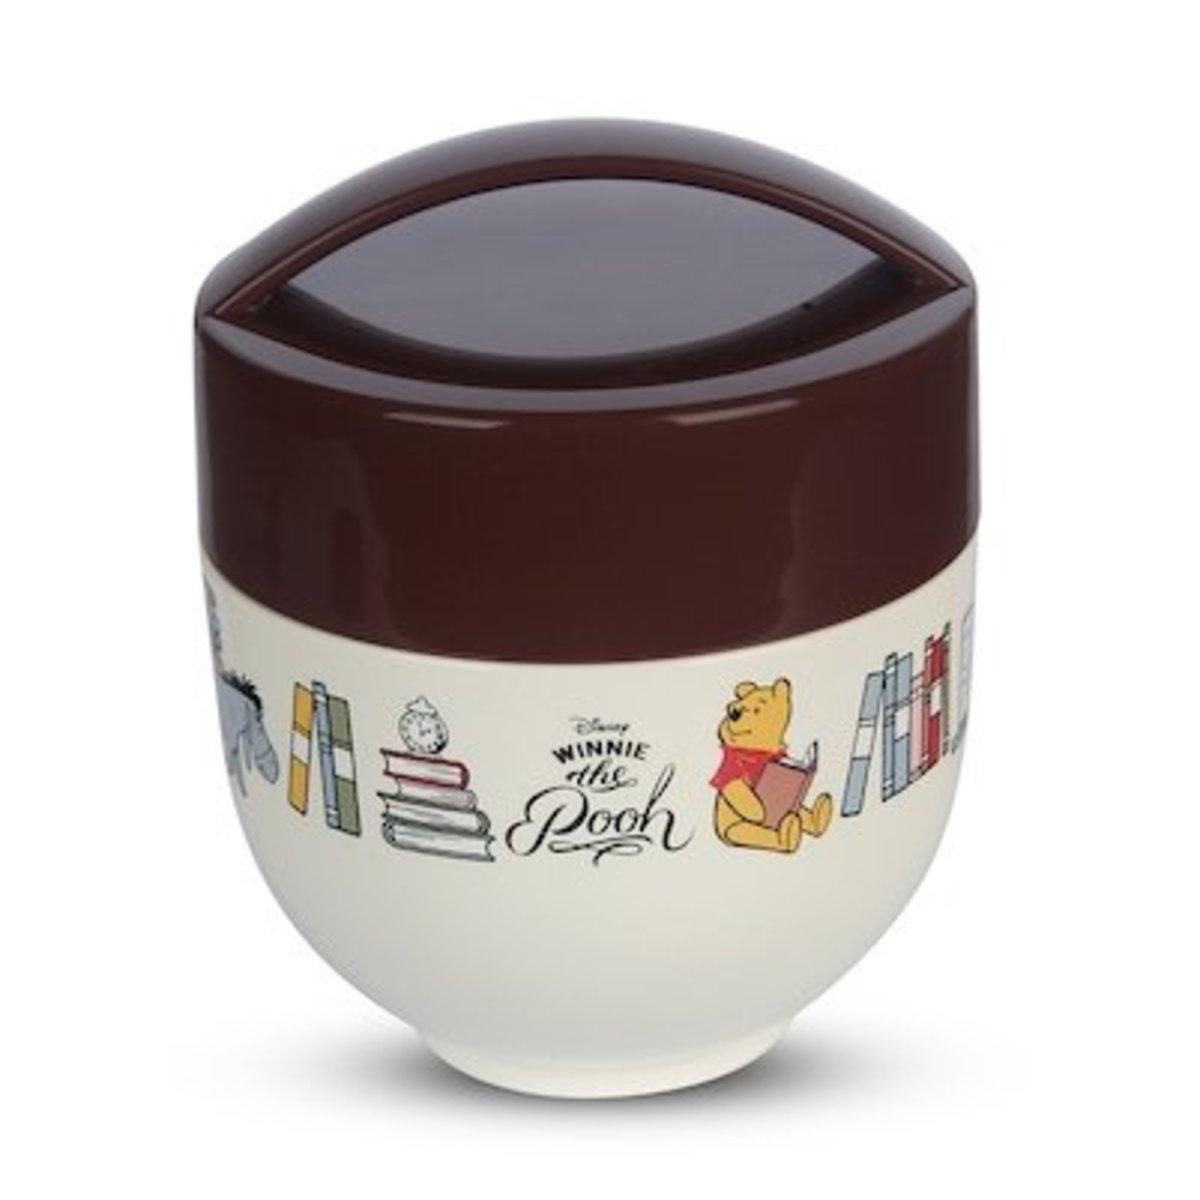 Disney Winnie the Pooh 540ML Vacuum Lunch Jar